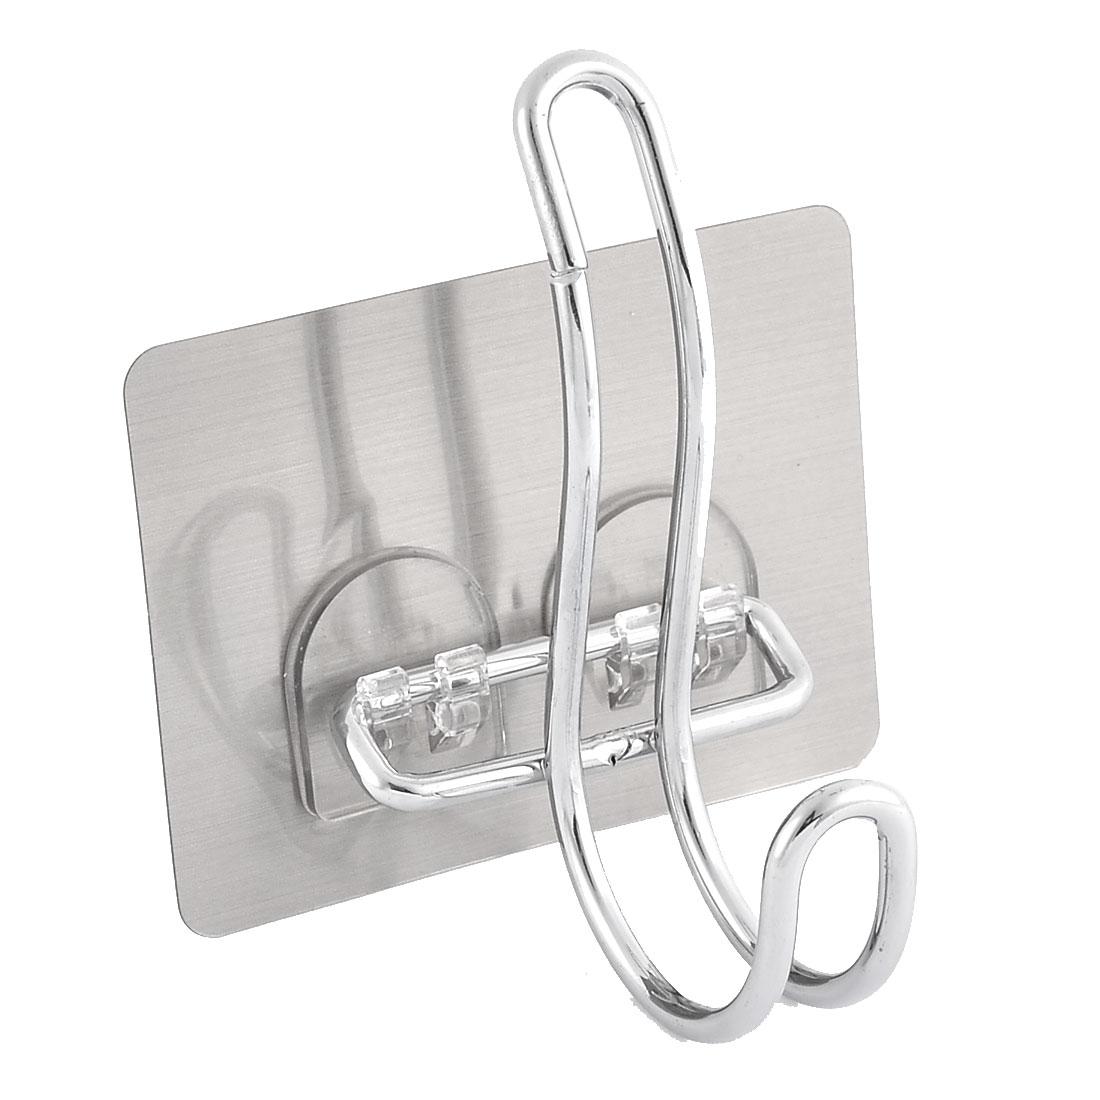 Home Bathroom Metal Self Adhesive Hat Towel Bag Clothes Hook Hanger Silver Tone